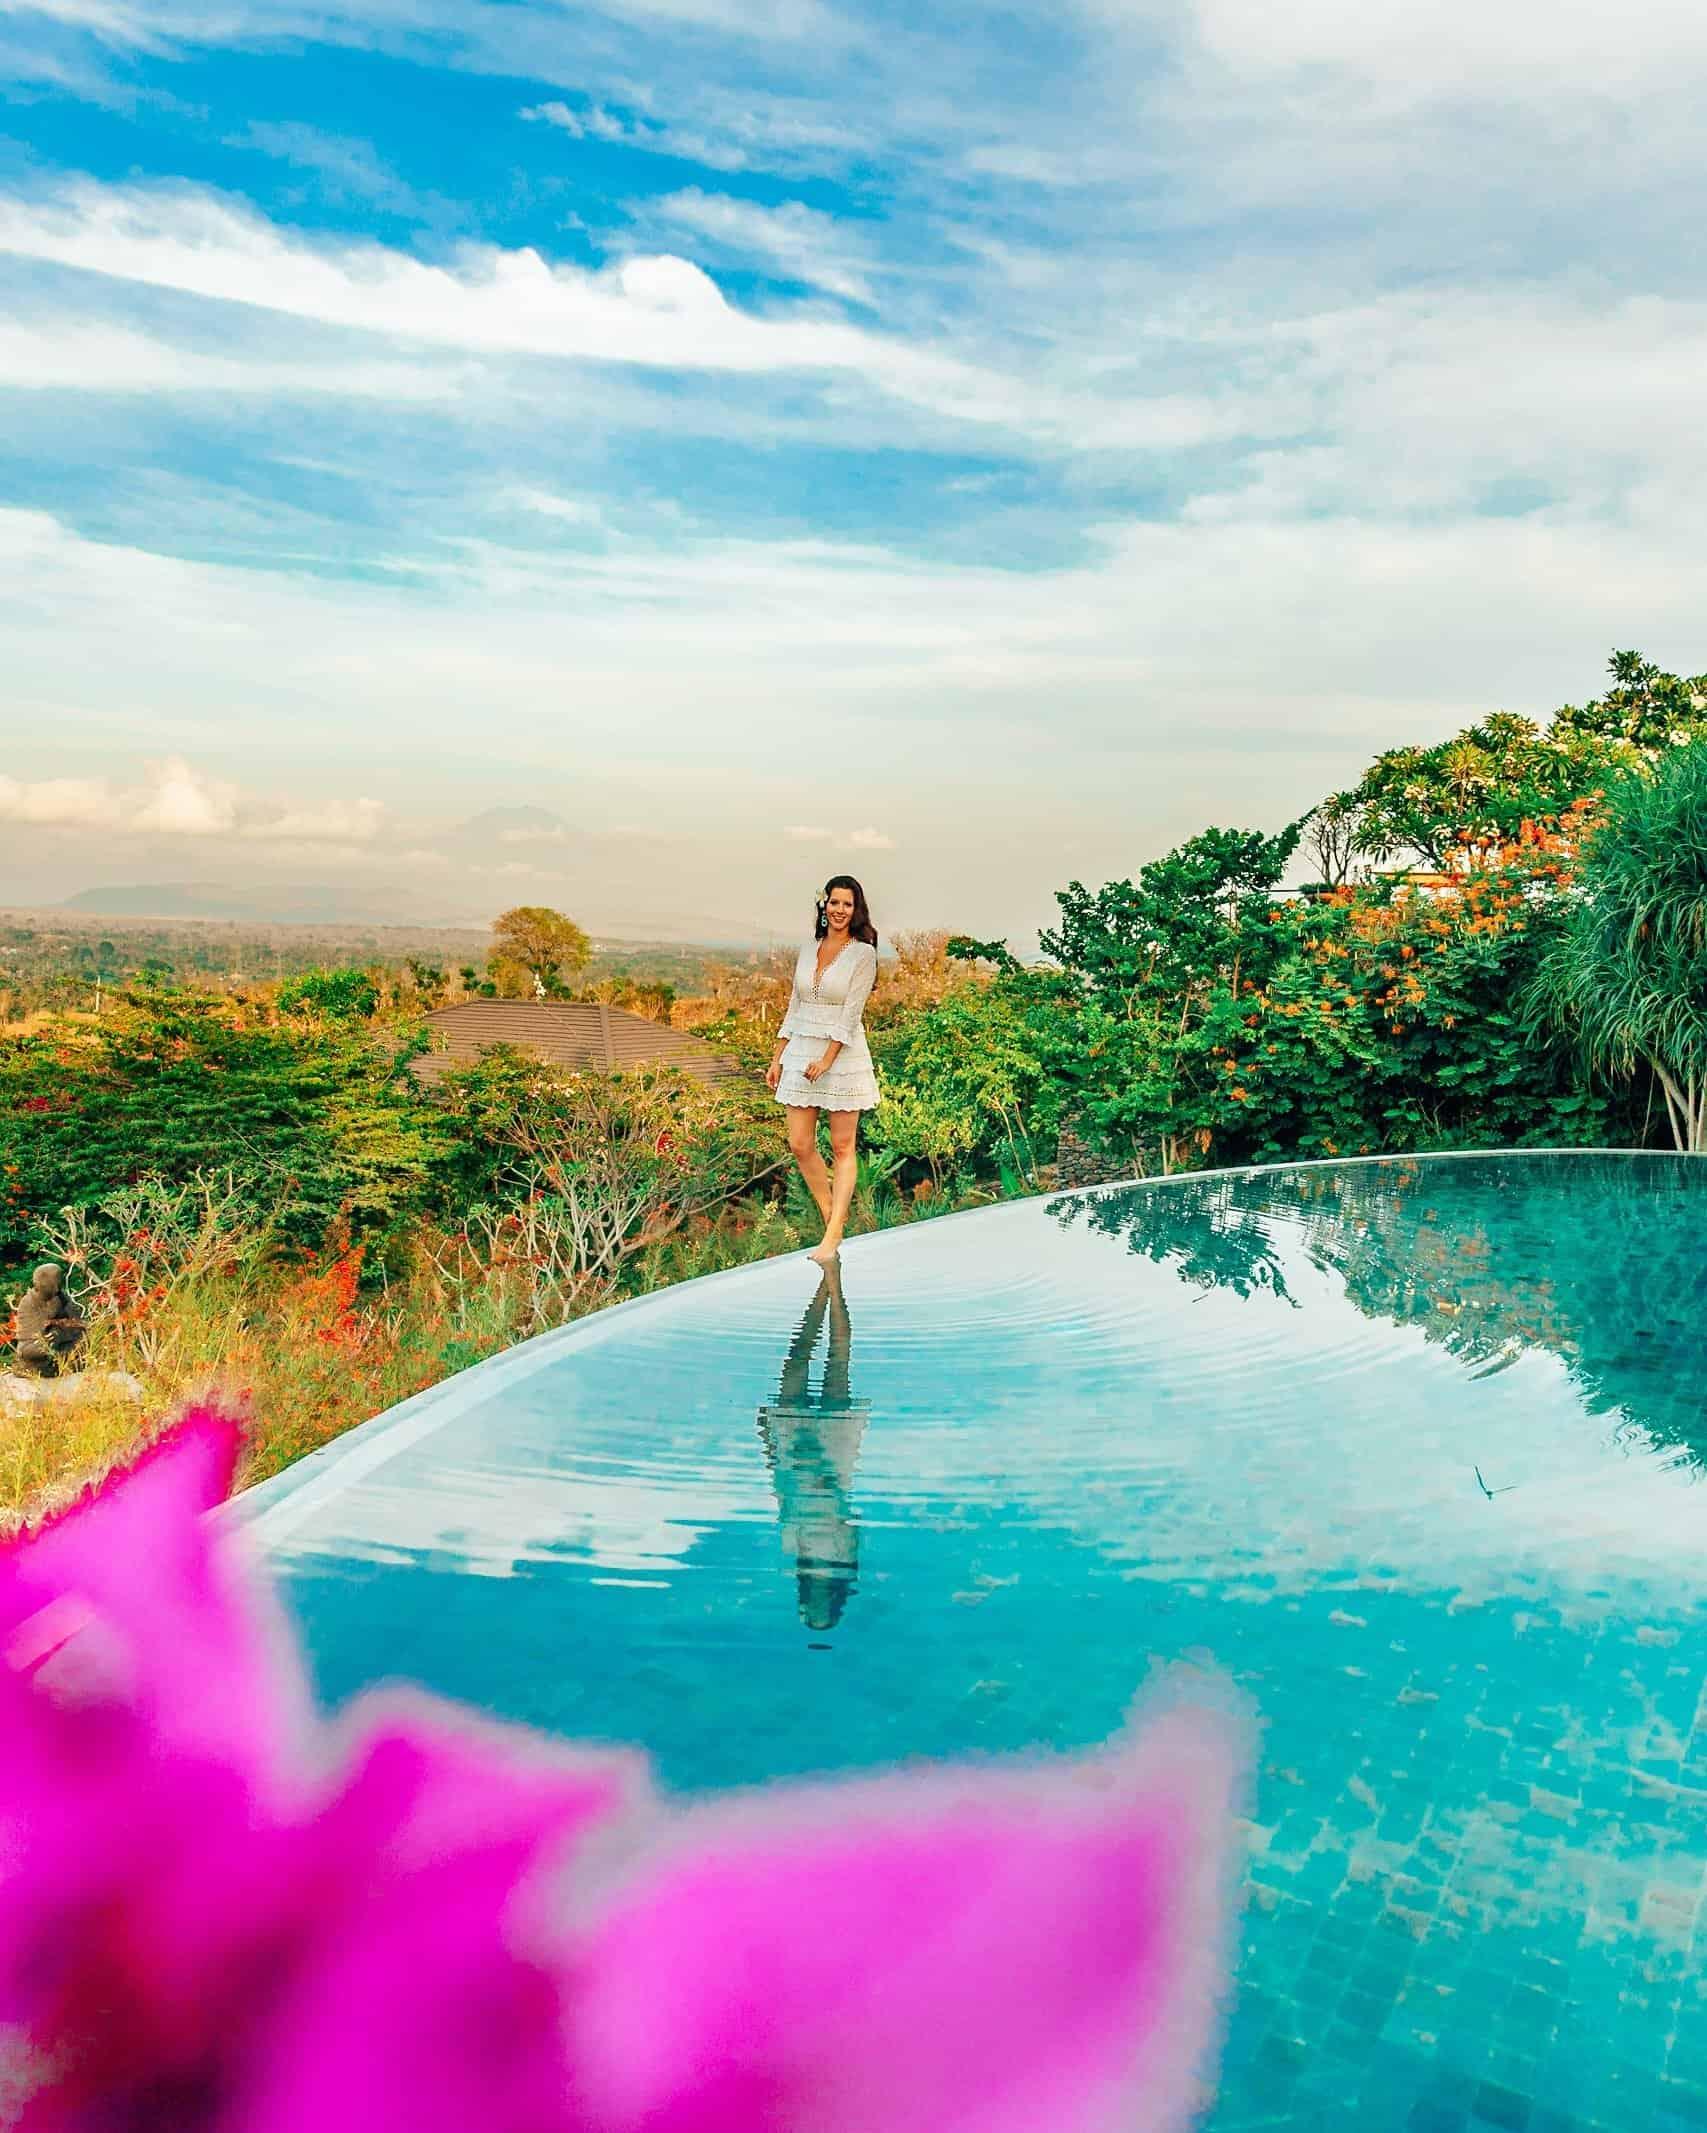 Bettina Walking on Infinity Pool Sumberkima Bali